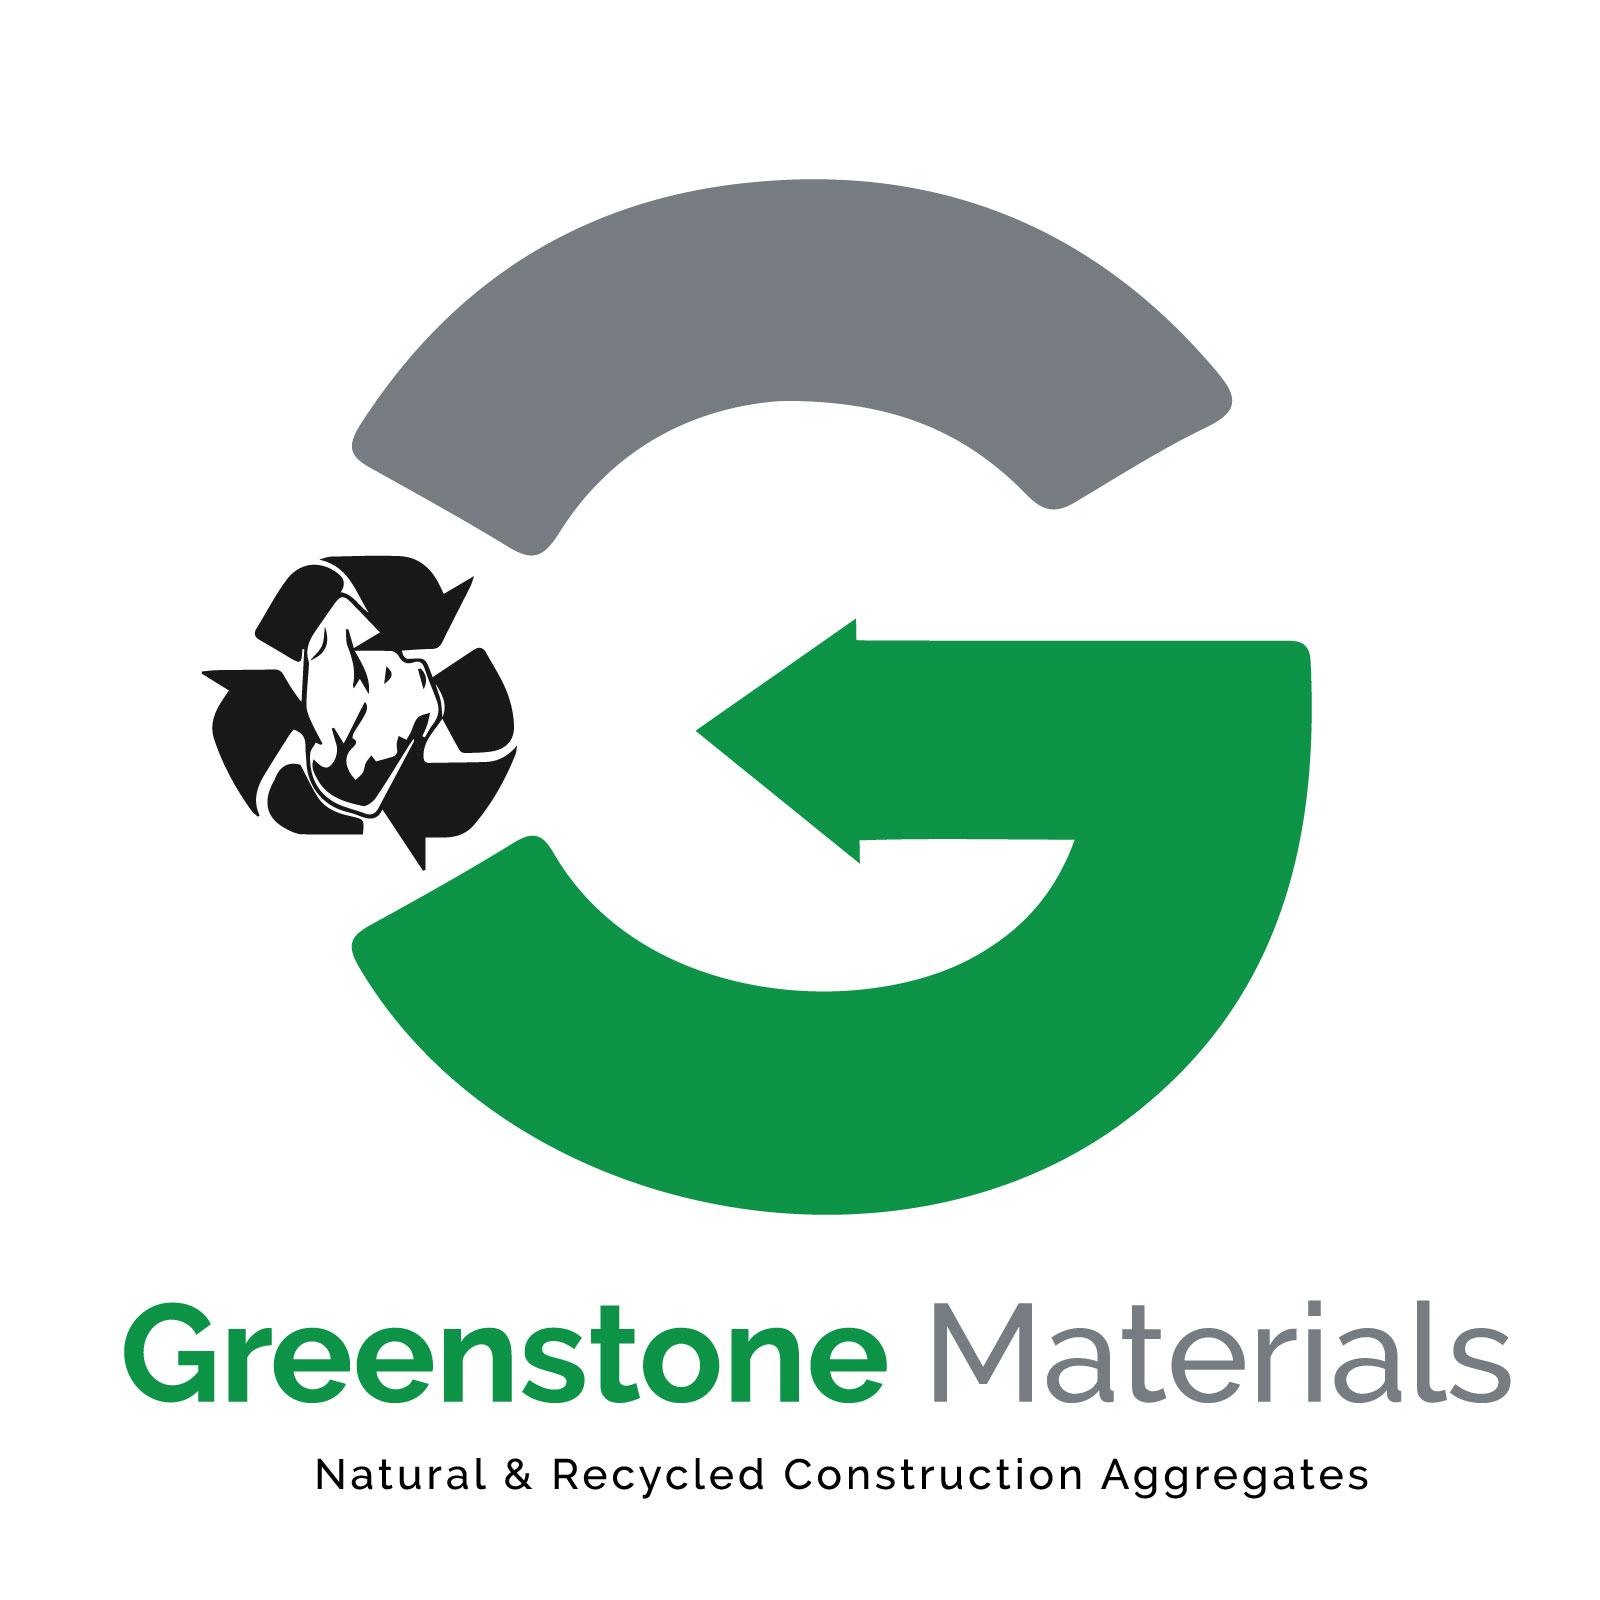 Greenstone Materials